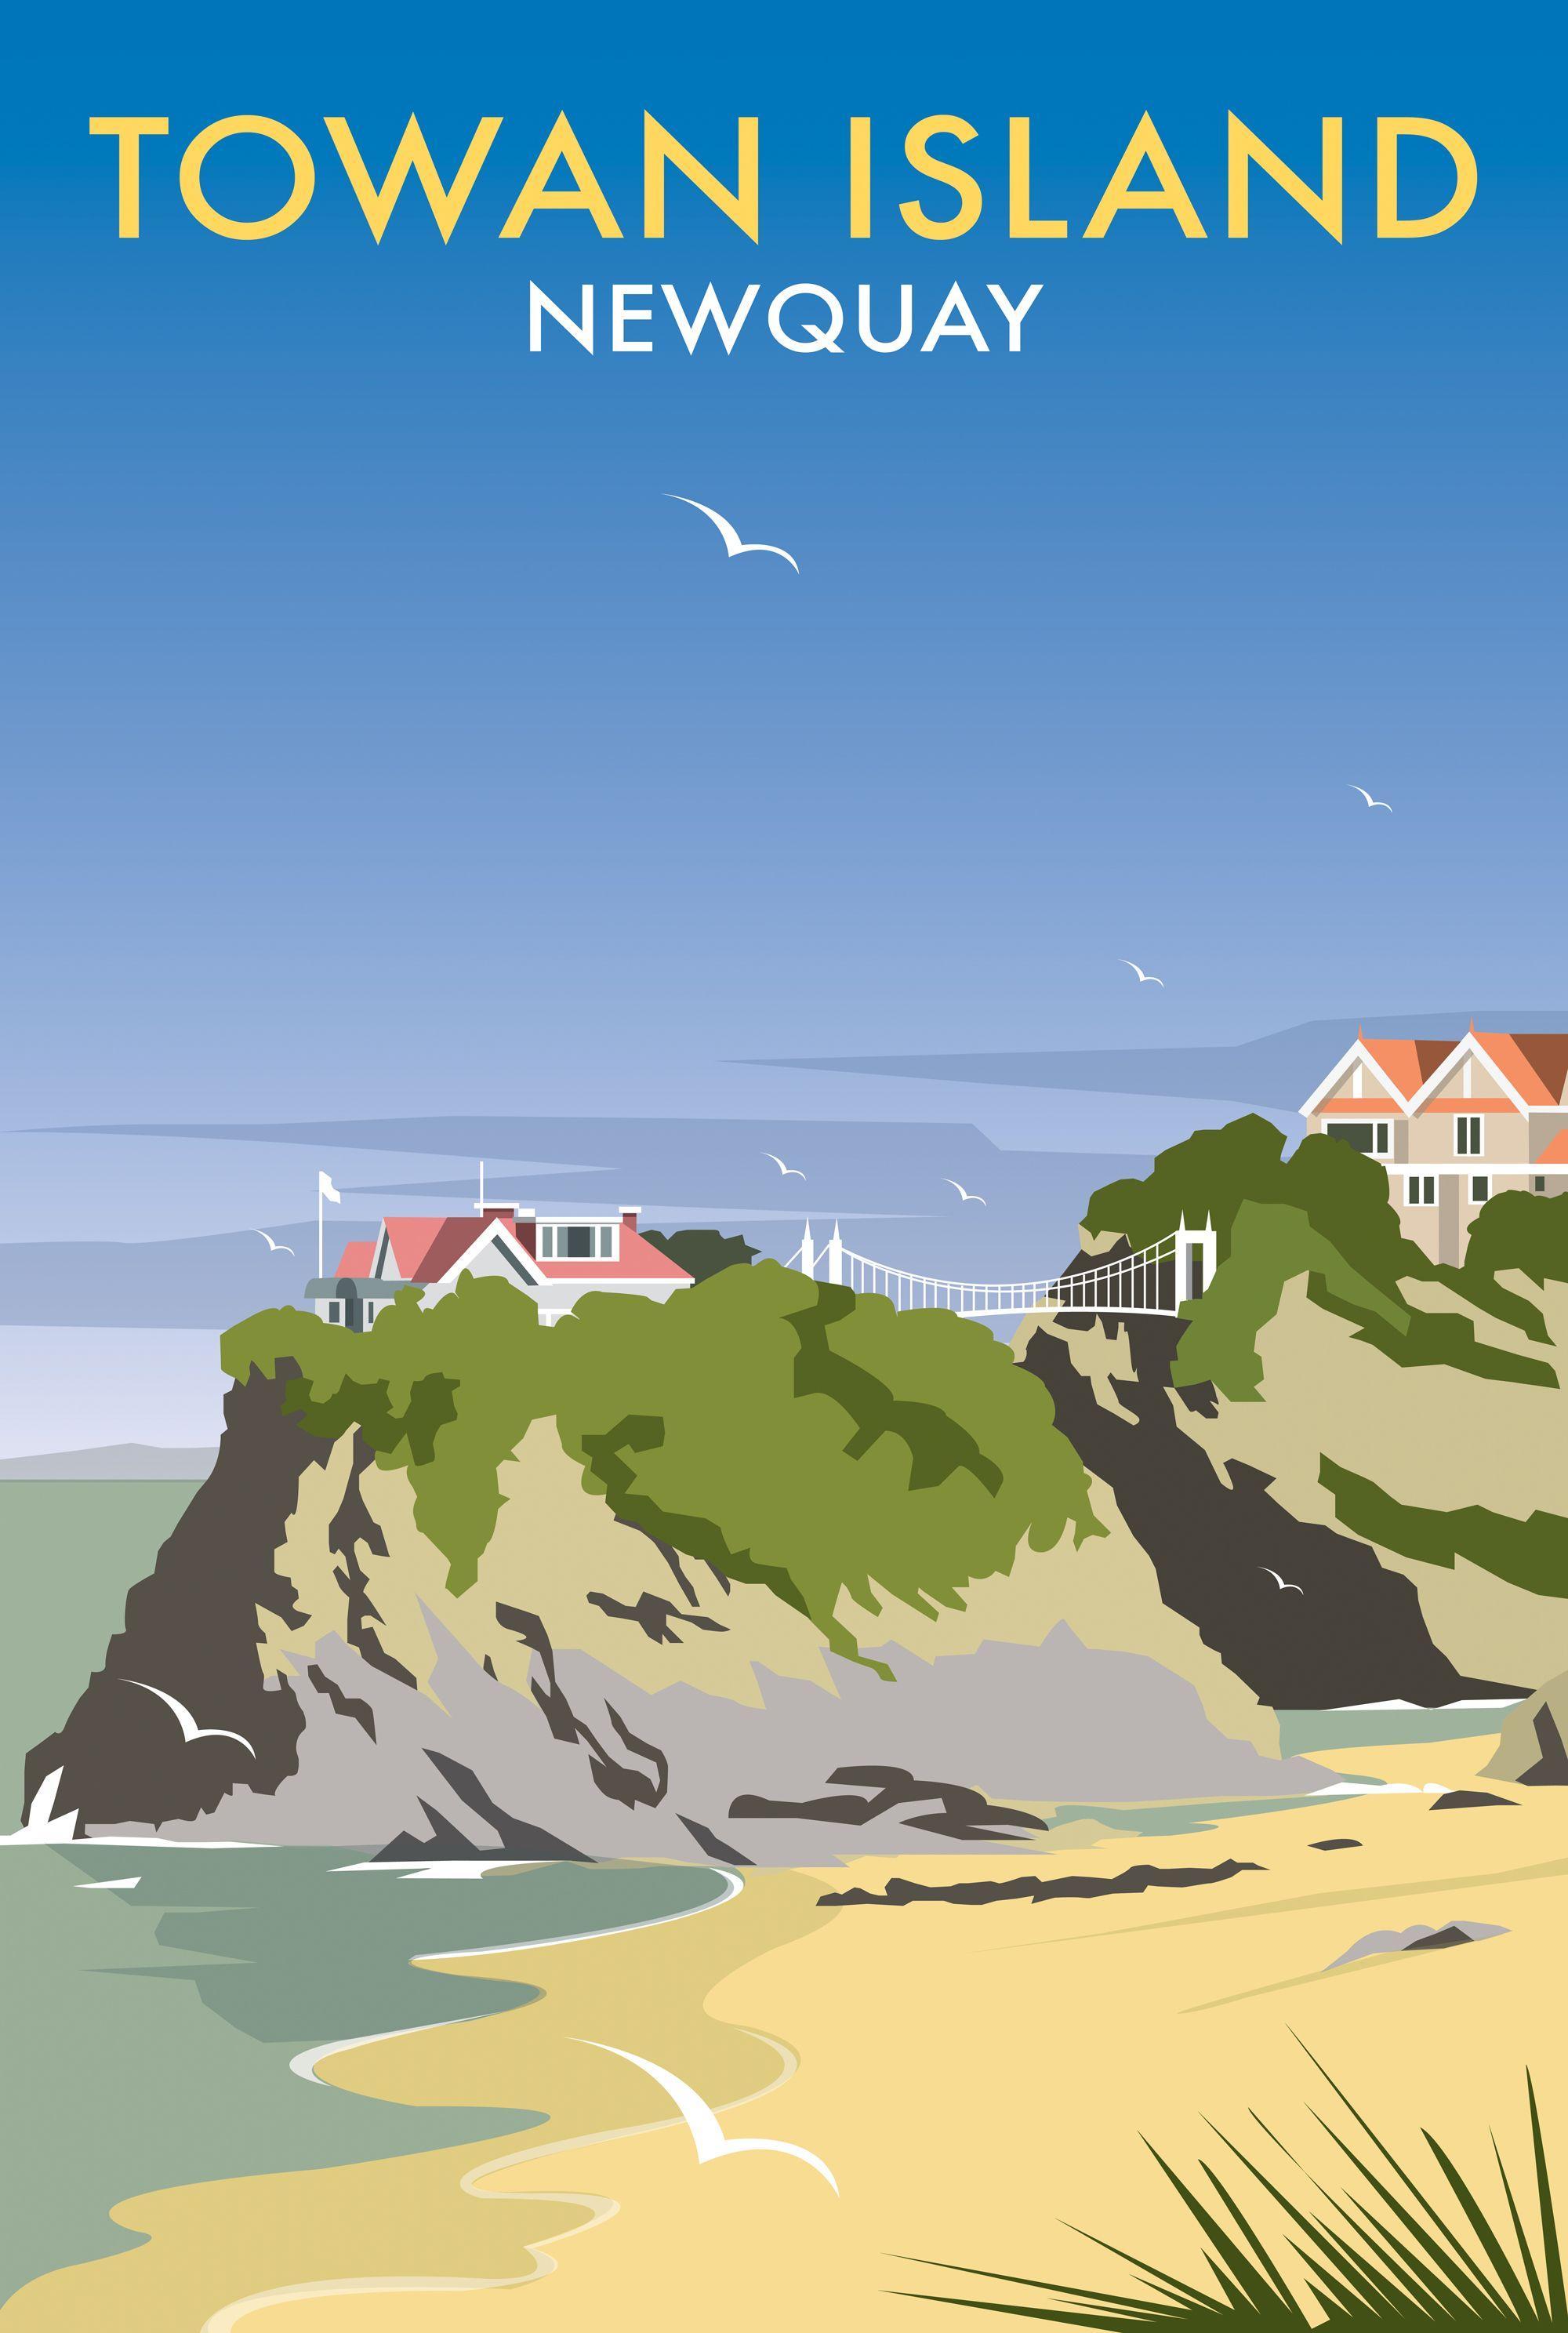 towan island dt39 beach and coastal print by dave. Black Bedroom Furniture Sets. Home Design Ideas